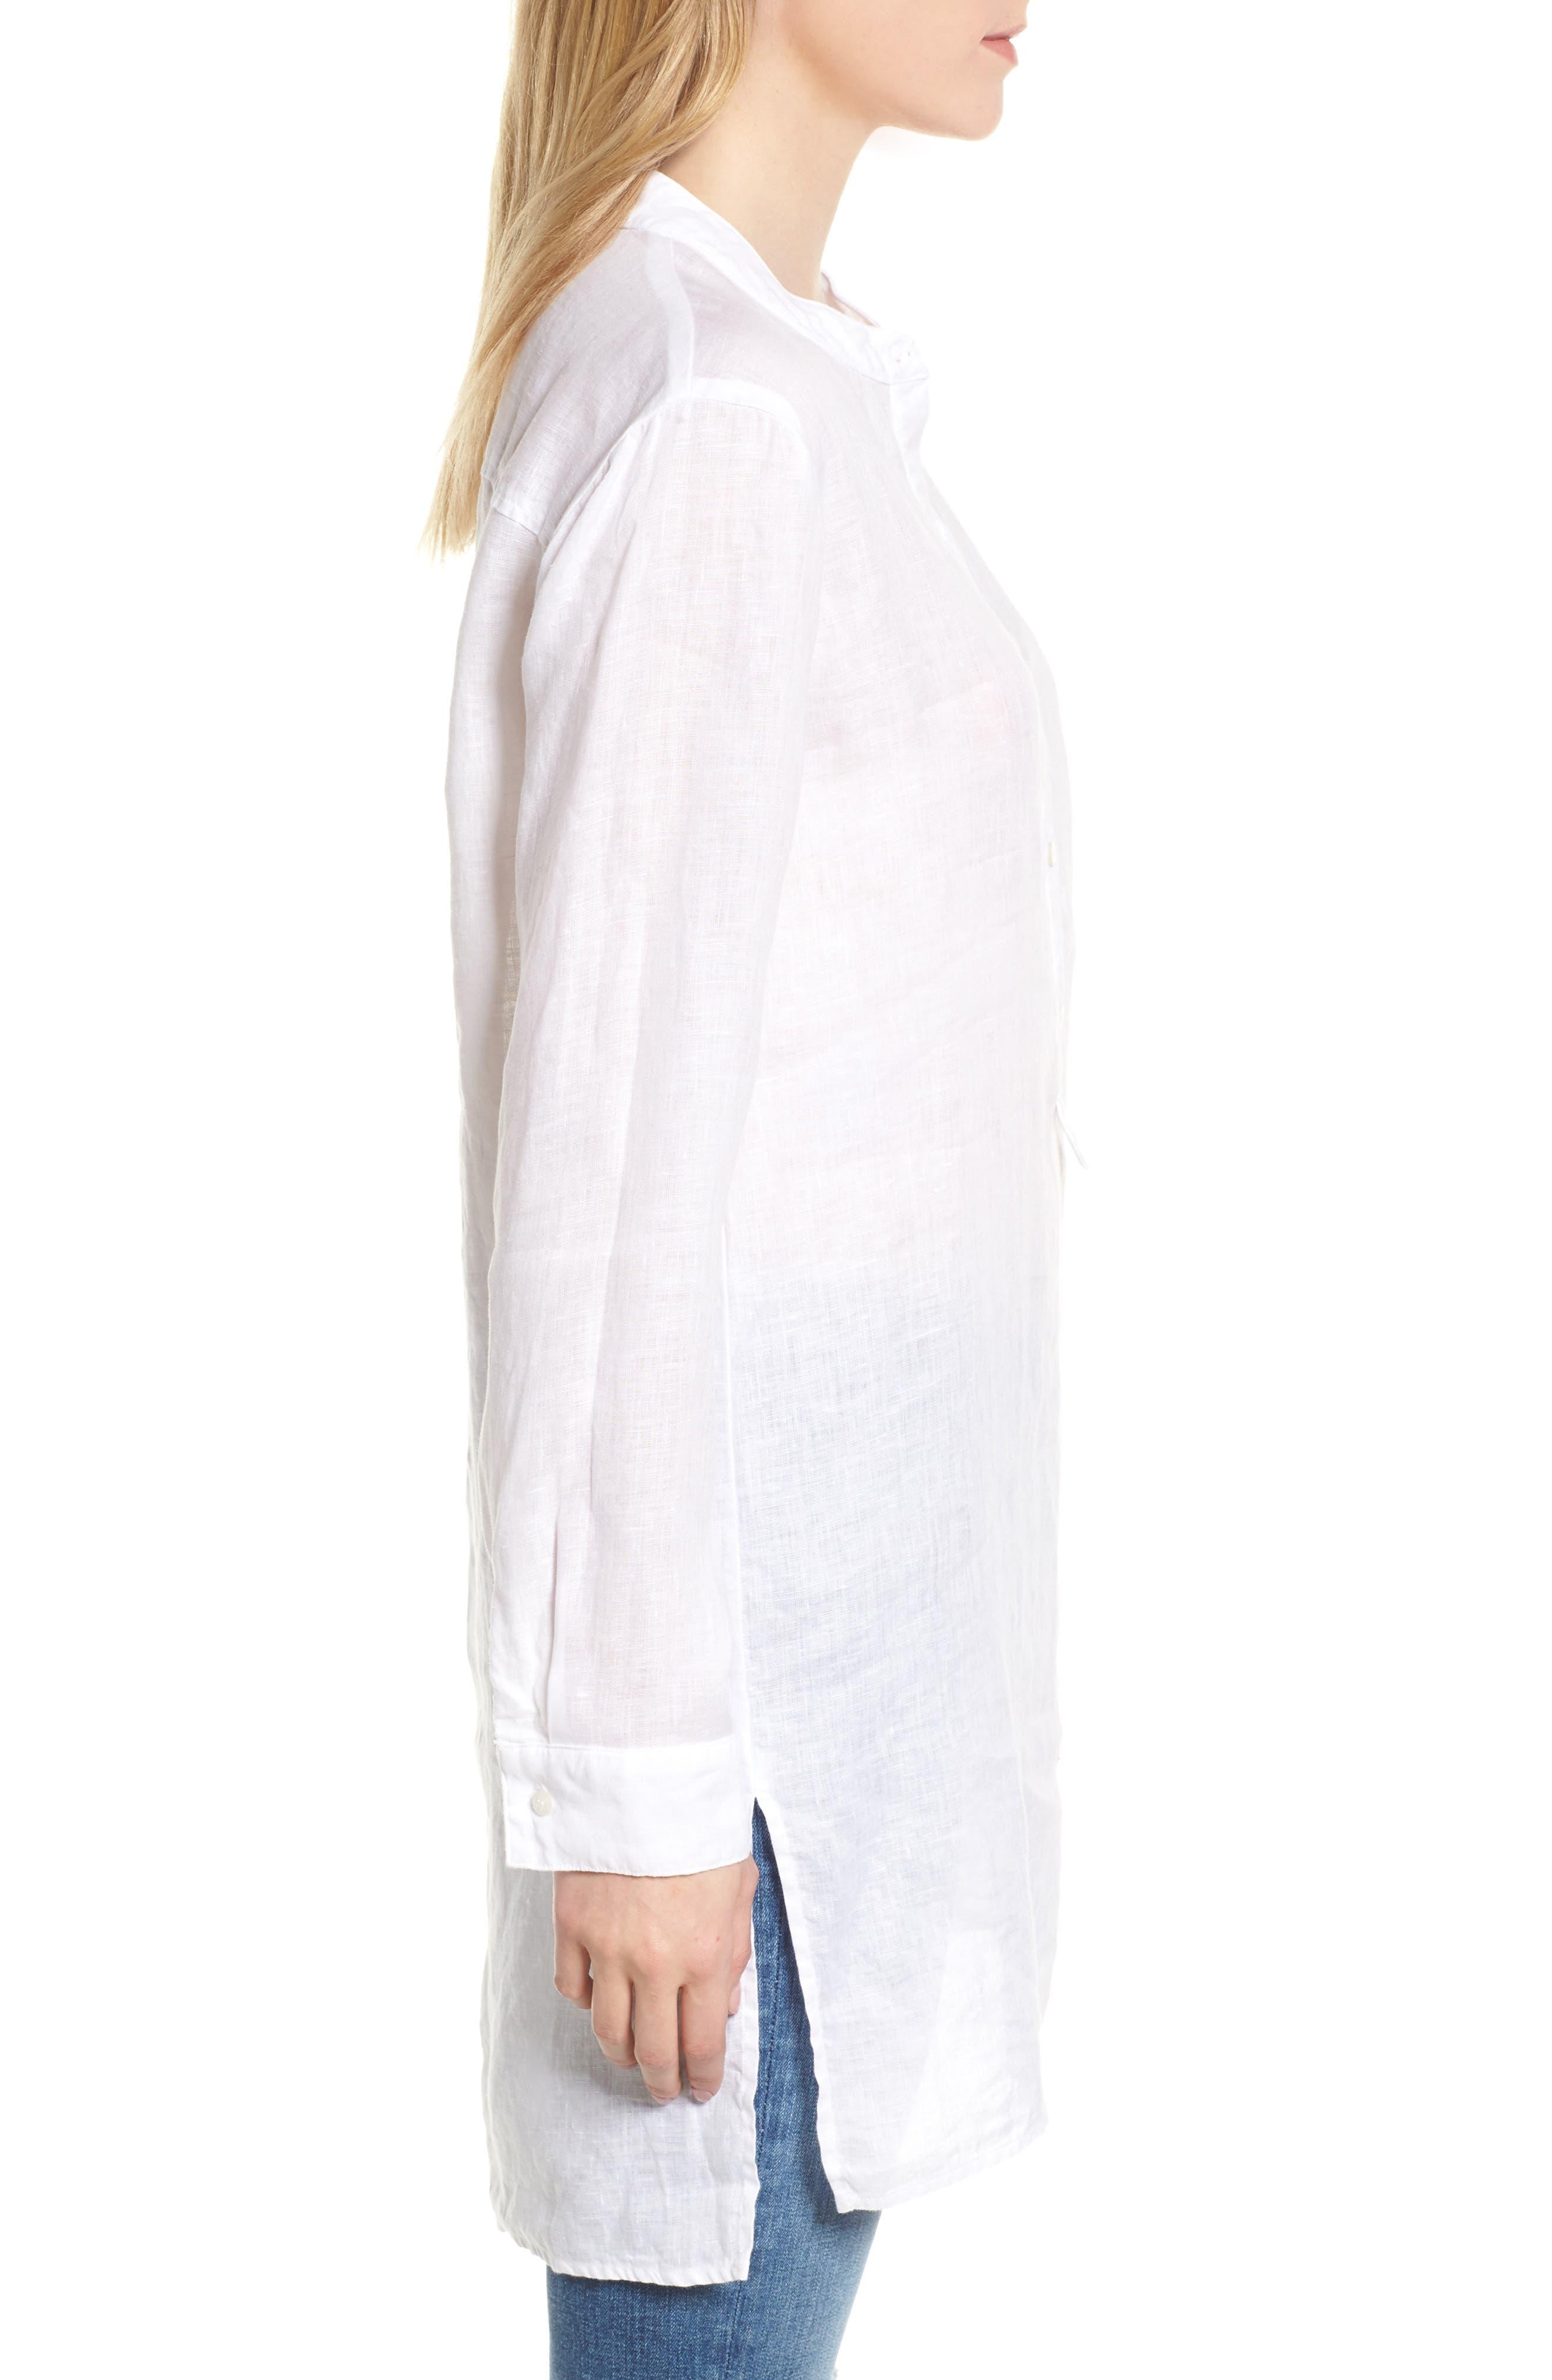 Shirting Tunic Top,                             Alternate thumbnail 3, color,                             White